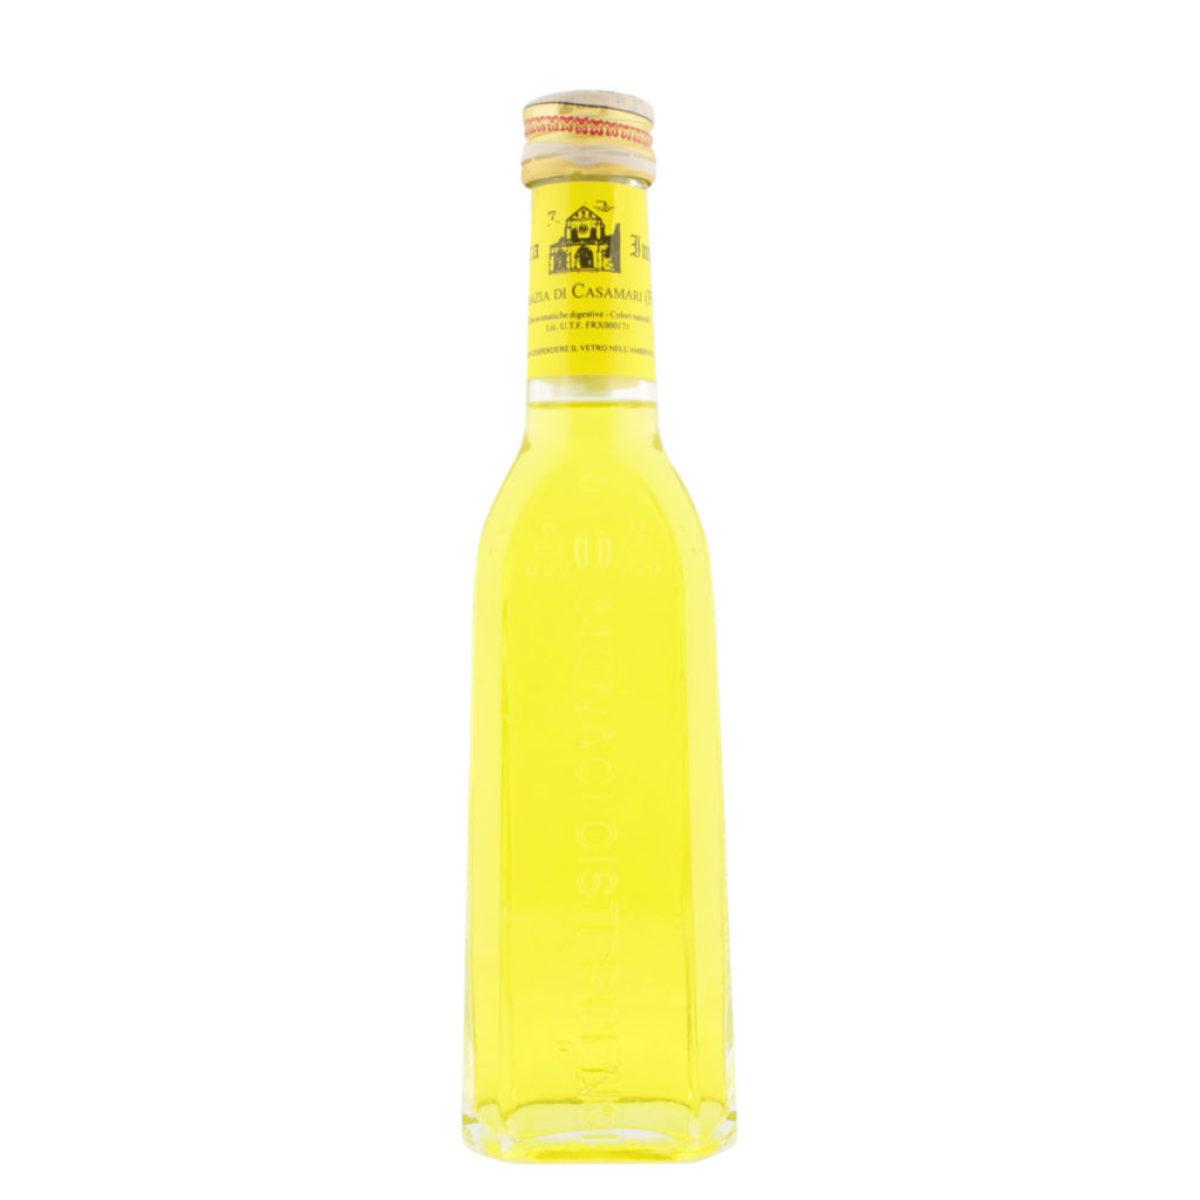 Gocce Imperiali Bottiglia classica 20cl